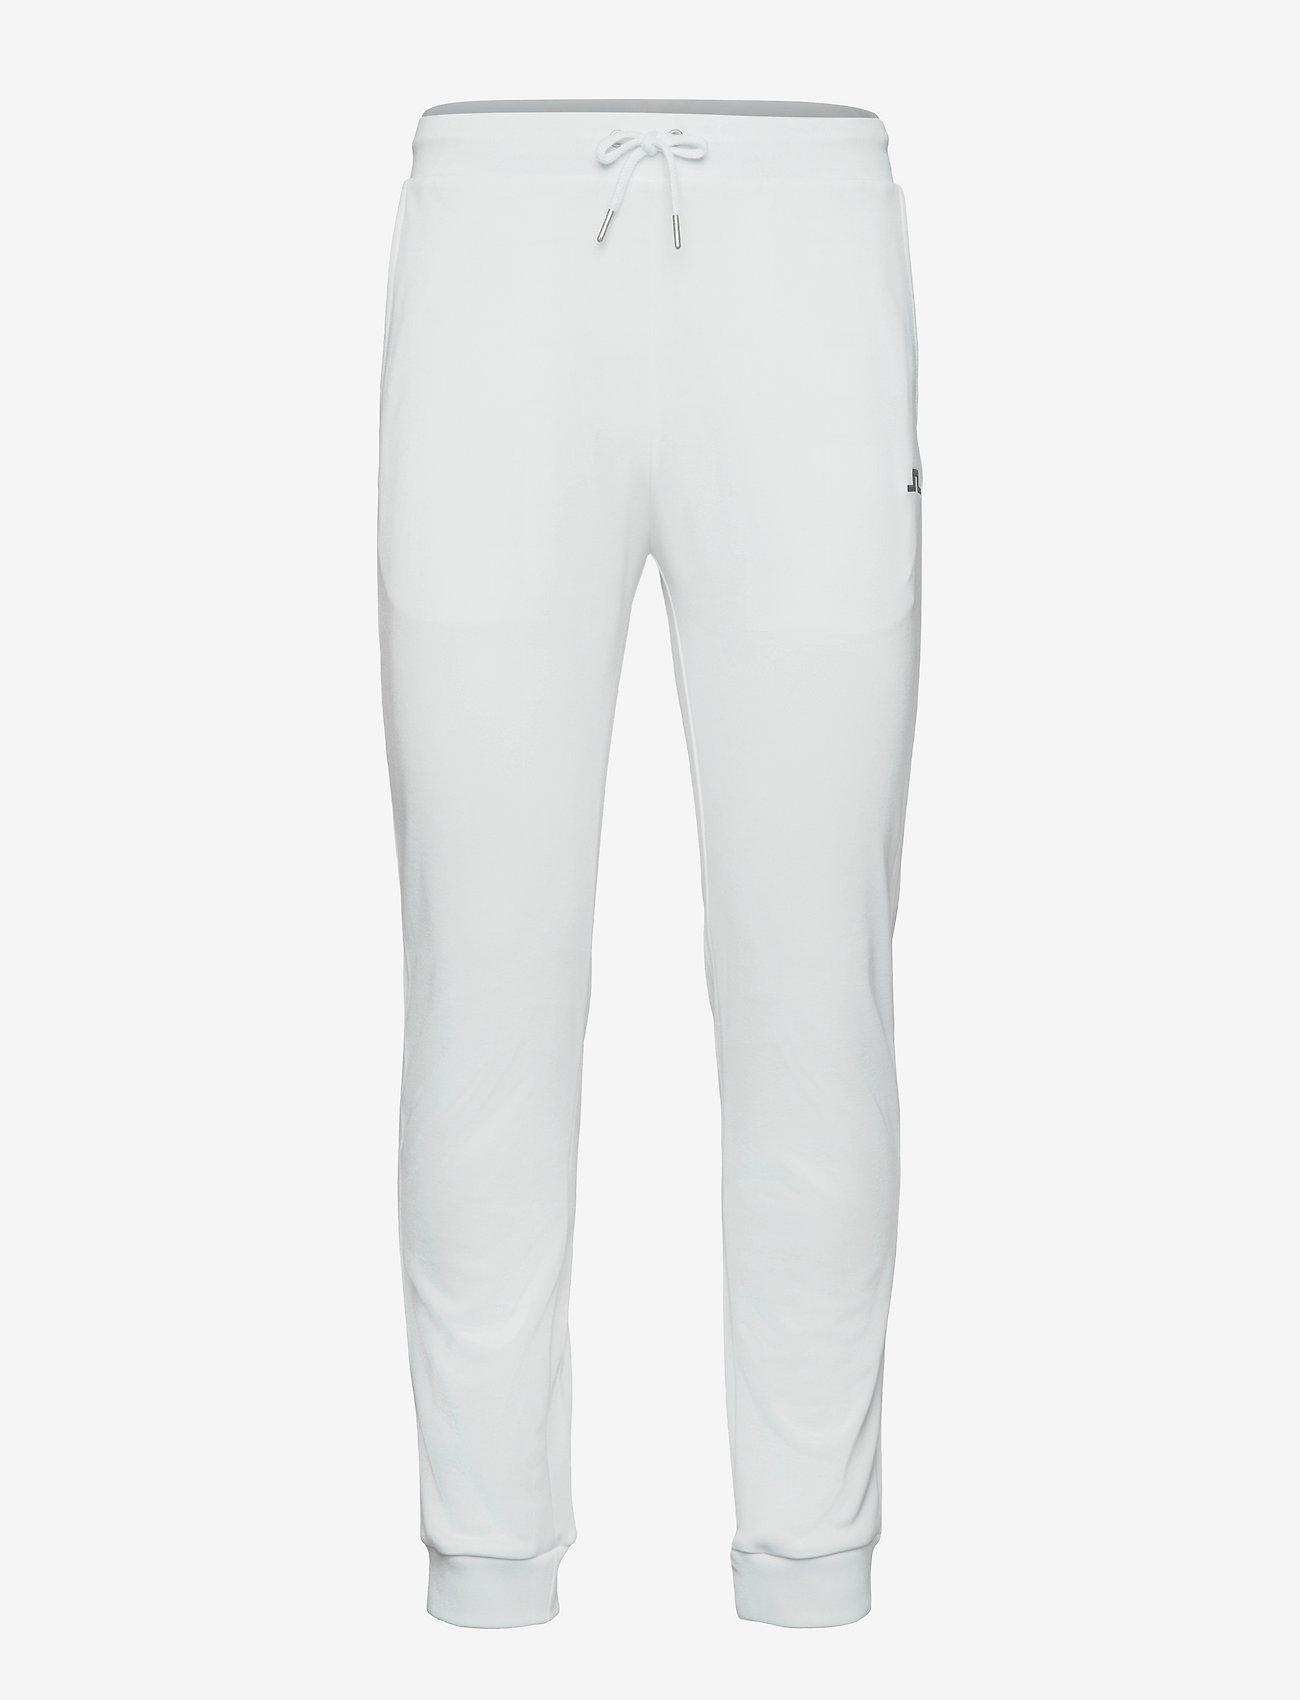 J. Lindeberg Golf - Stretch Fleece Light Pant - golfbukser - white - 0